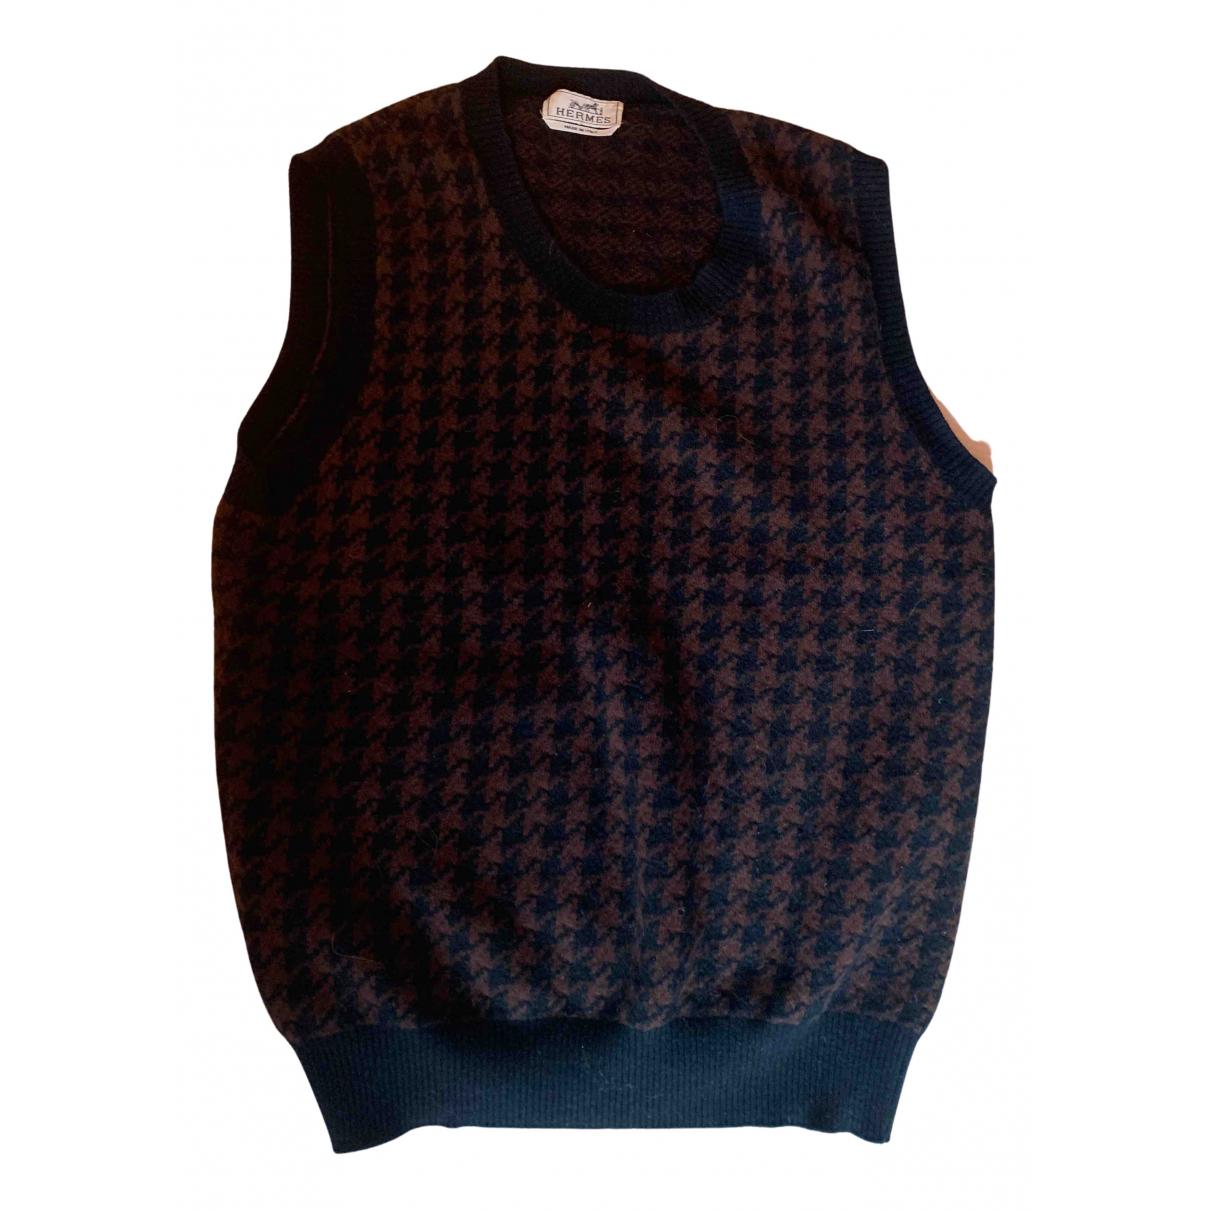 Hermes - Pull   pour femme en laine - marron